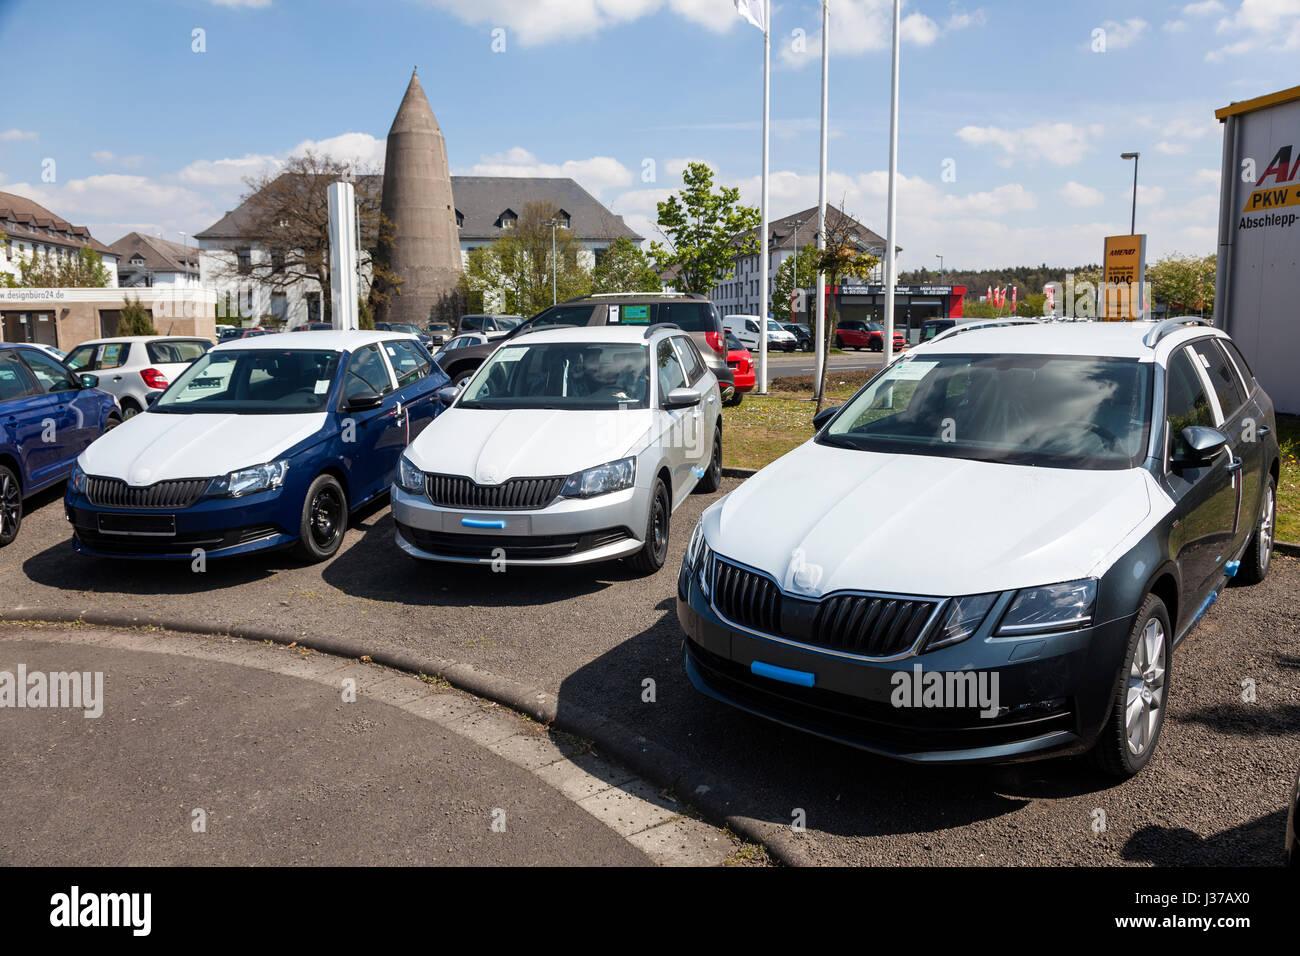 Frankfurt, Germany - March 30, 2017: New Skoda Fabia and Octavia cars at a dealership in Frankfurt, Germany - Stock Image